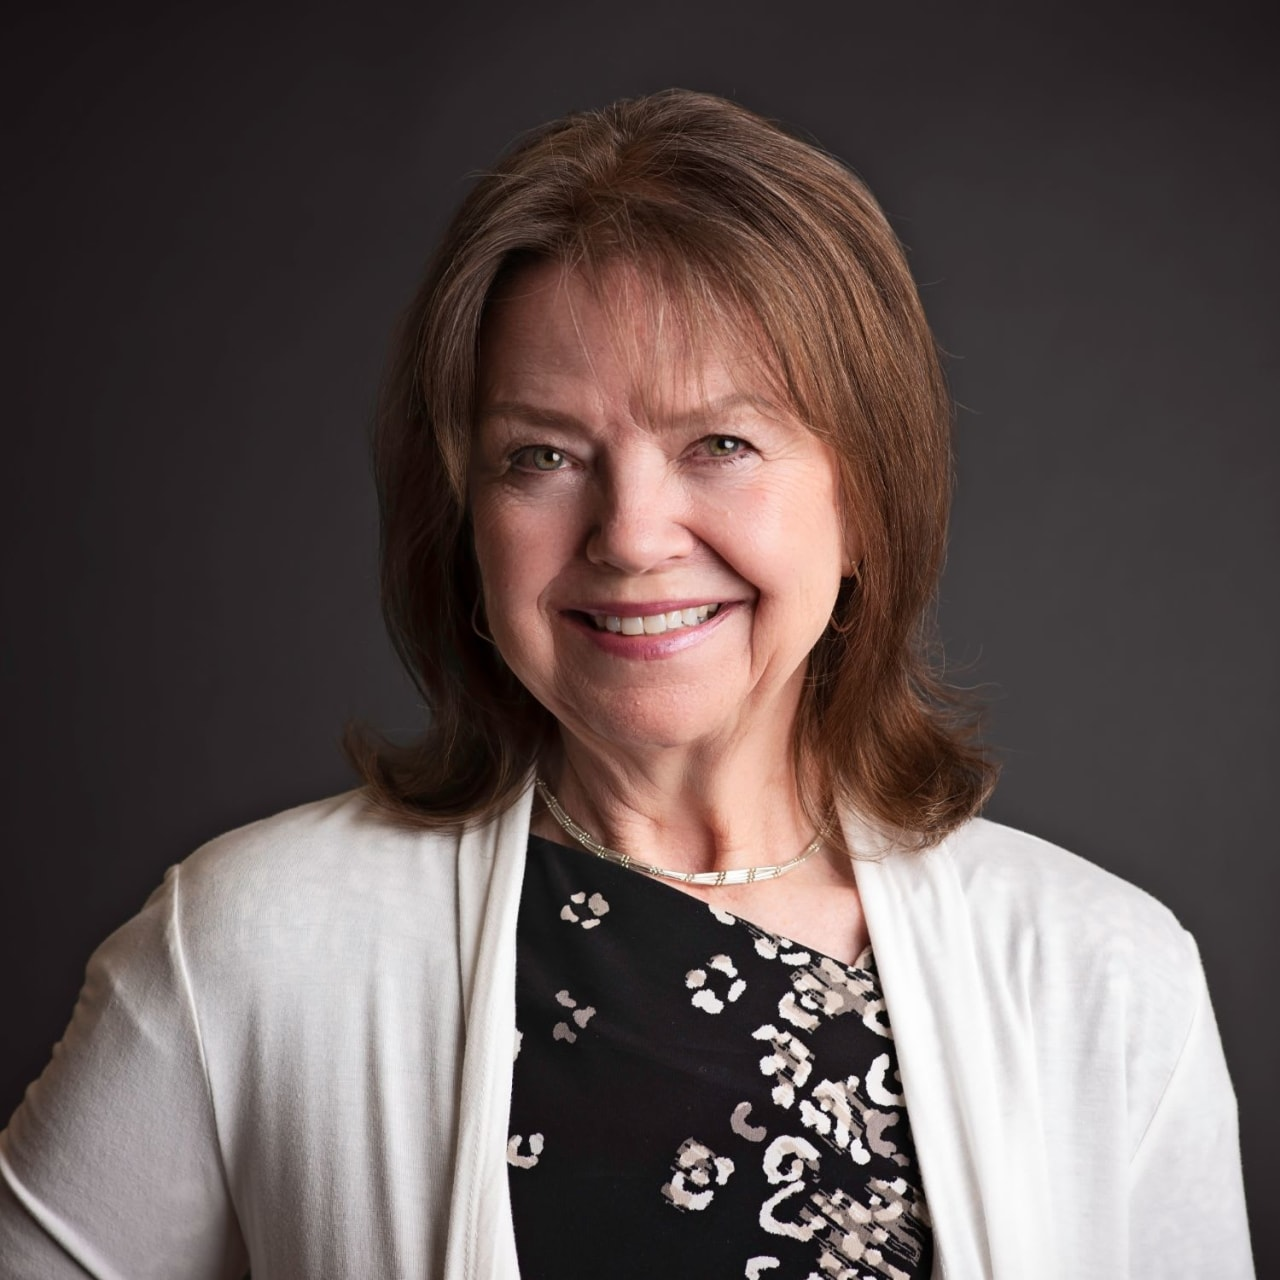 Arlene Hachenberger